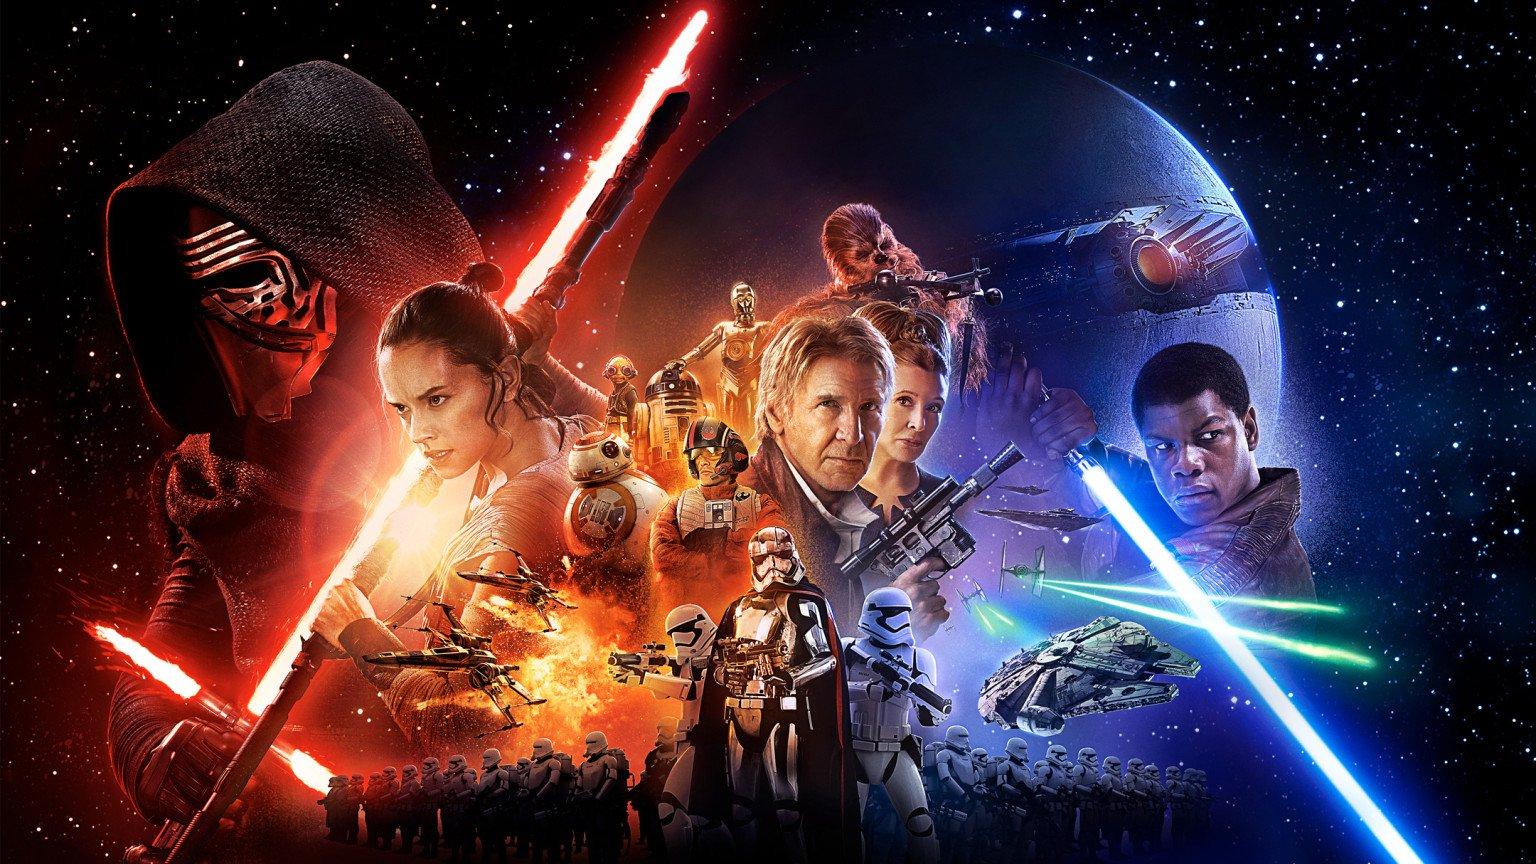 star wars the force awakens desktop background 1536x864